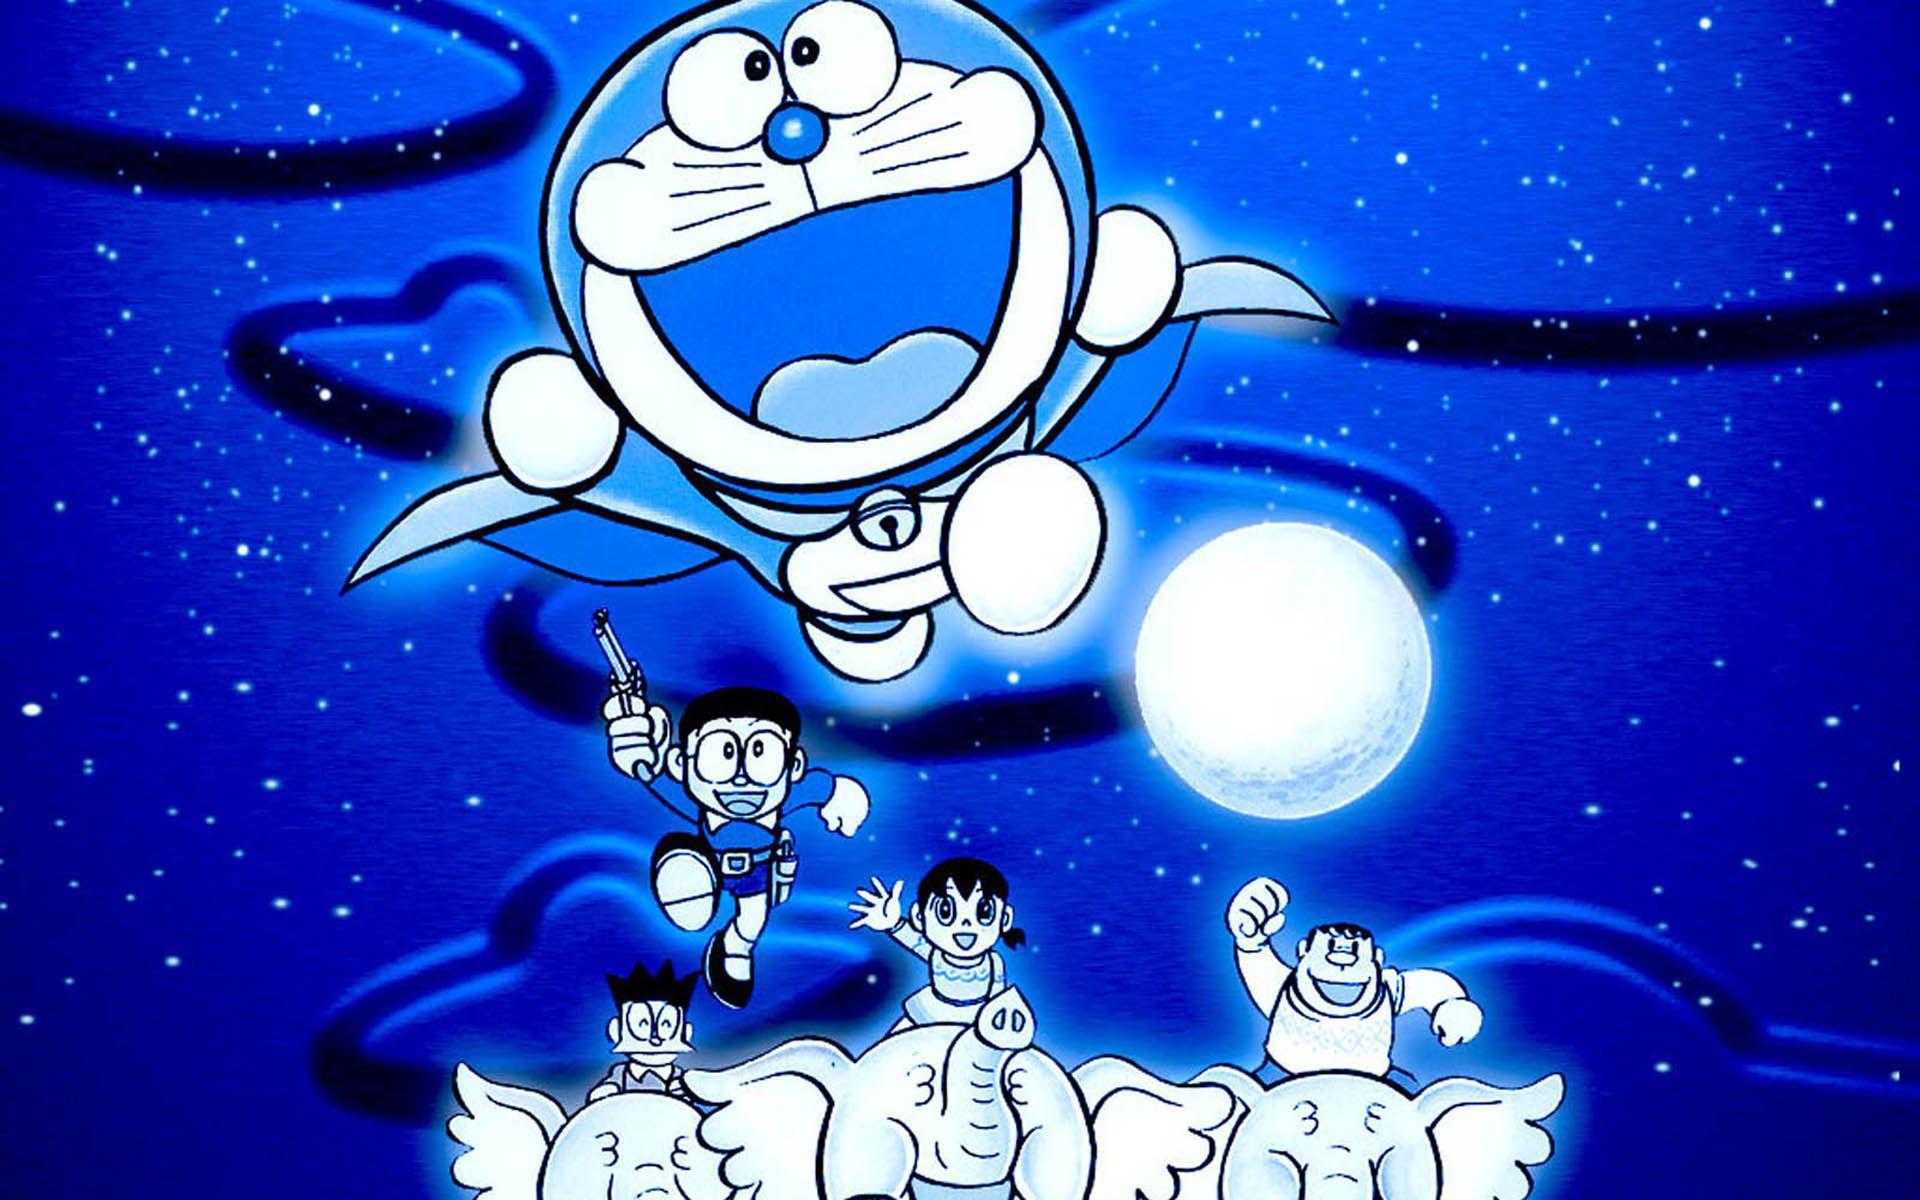 Wallpaper And Doraemon Top Anime Wallpaper Doraemon Wallpapers Cartoon Wallpaper Cartoon Wallpaper Hd Download wallpaper anime doraemon